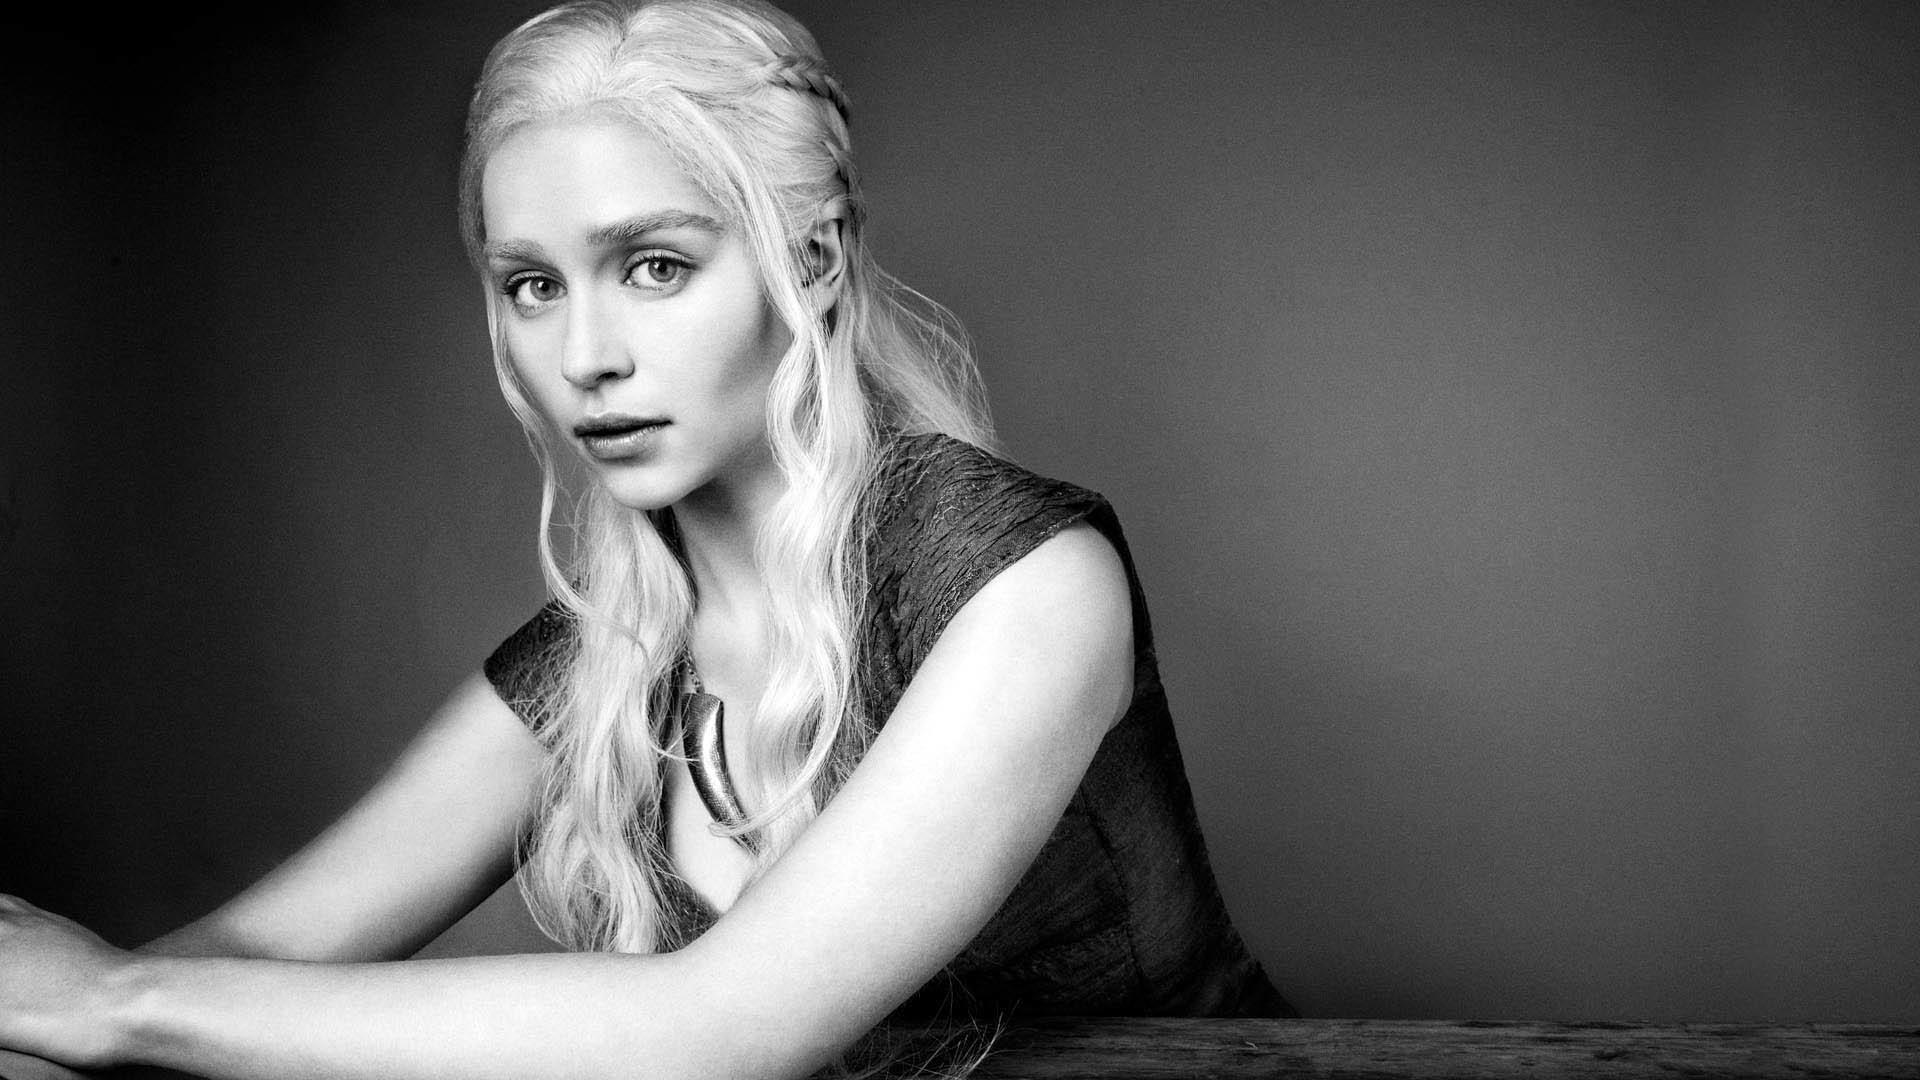 Emilia Clarke as Khaleesi Daenerys Targaryen – GoT wallpaper